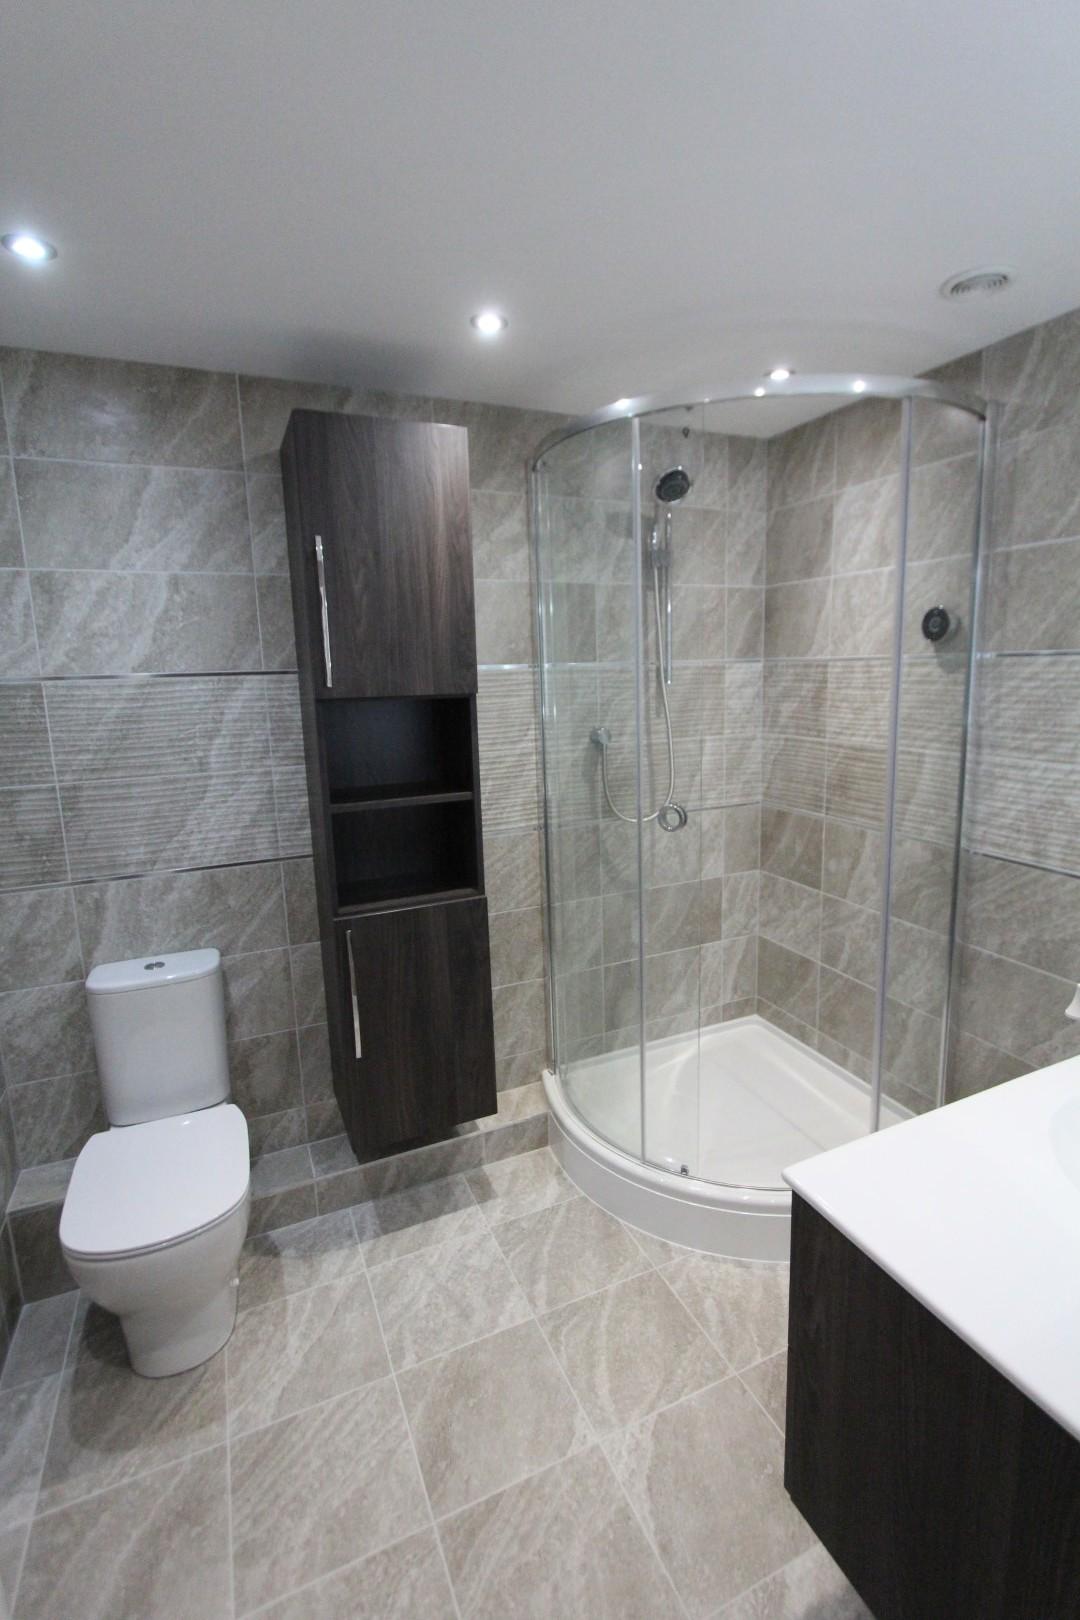 Dack Atlantic Bathrooms & Kitchens (1).jpeg